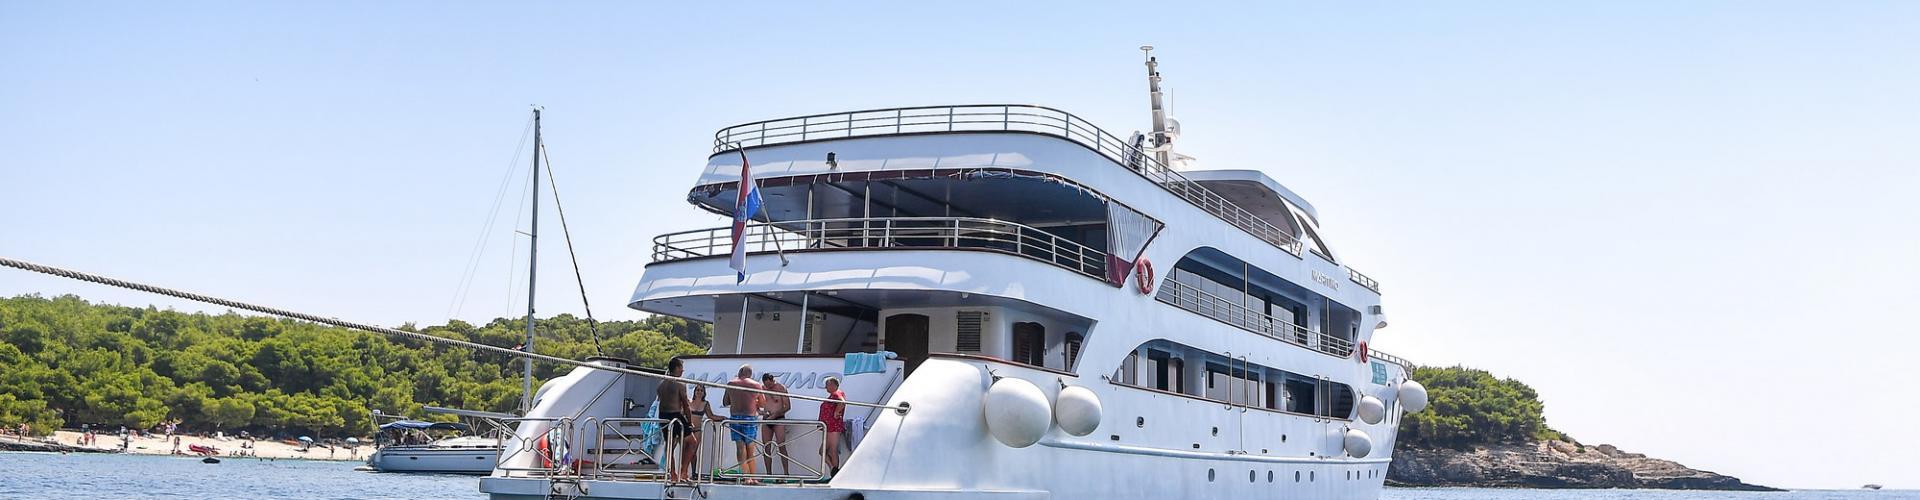 motor boat Deluxe Superior cruiser MV Maritimo